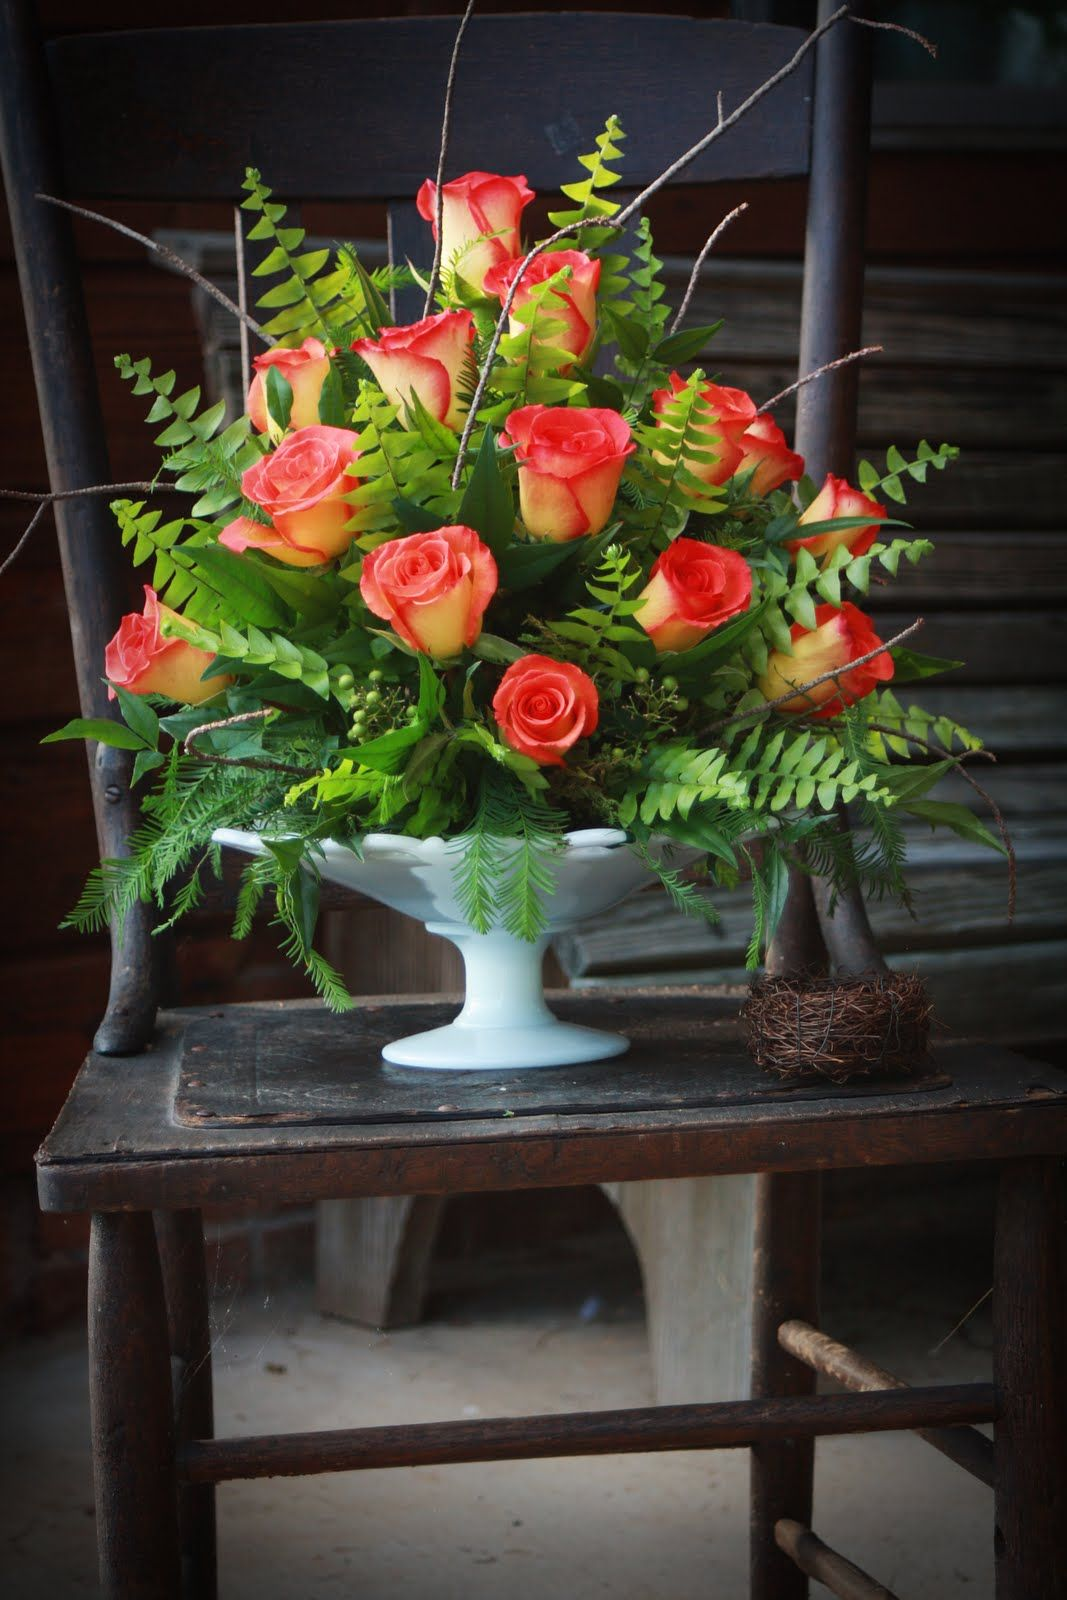 How To Arrange Flowers Flowers Pinterest Flowers Flower